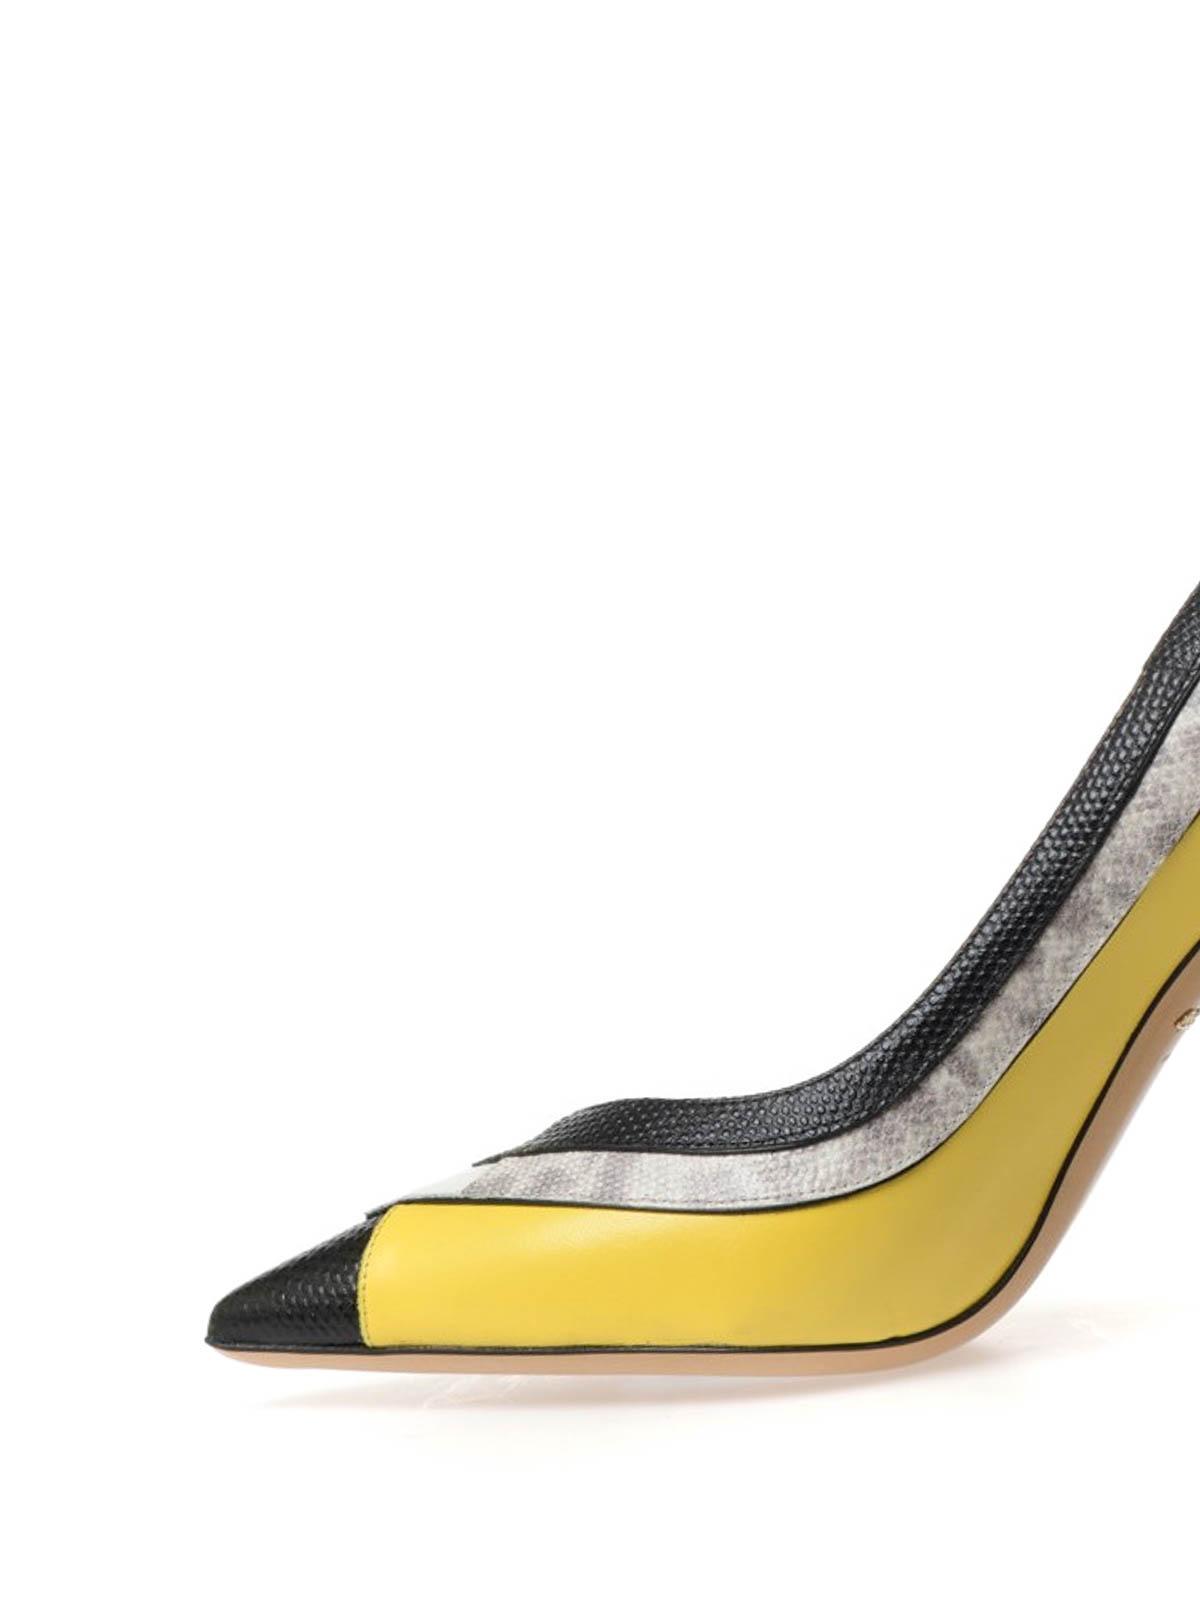 iKRIX Salvatore Ferragamo: court shoes - Susi pumps